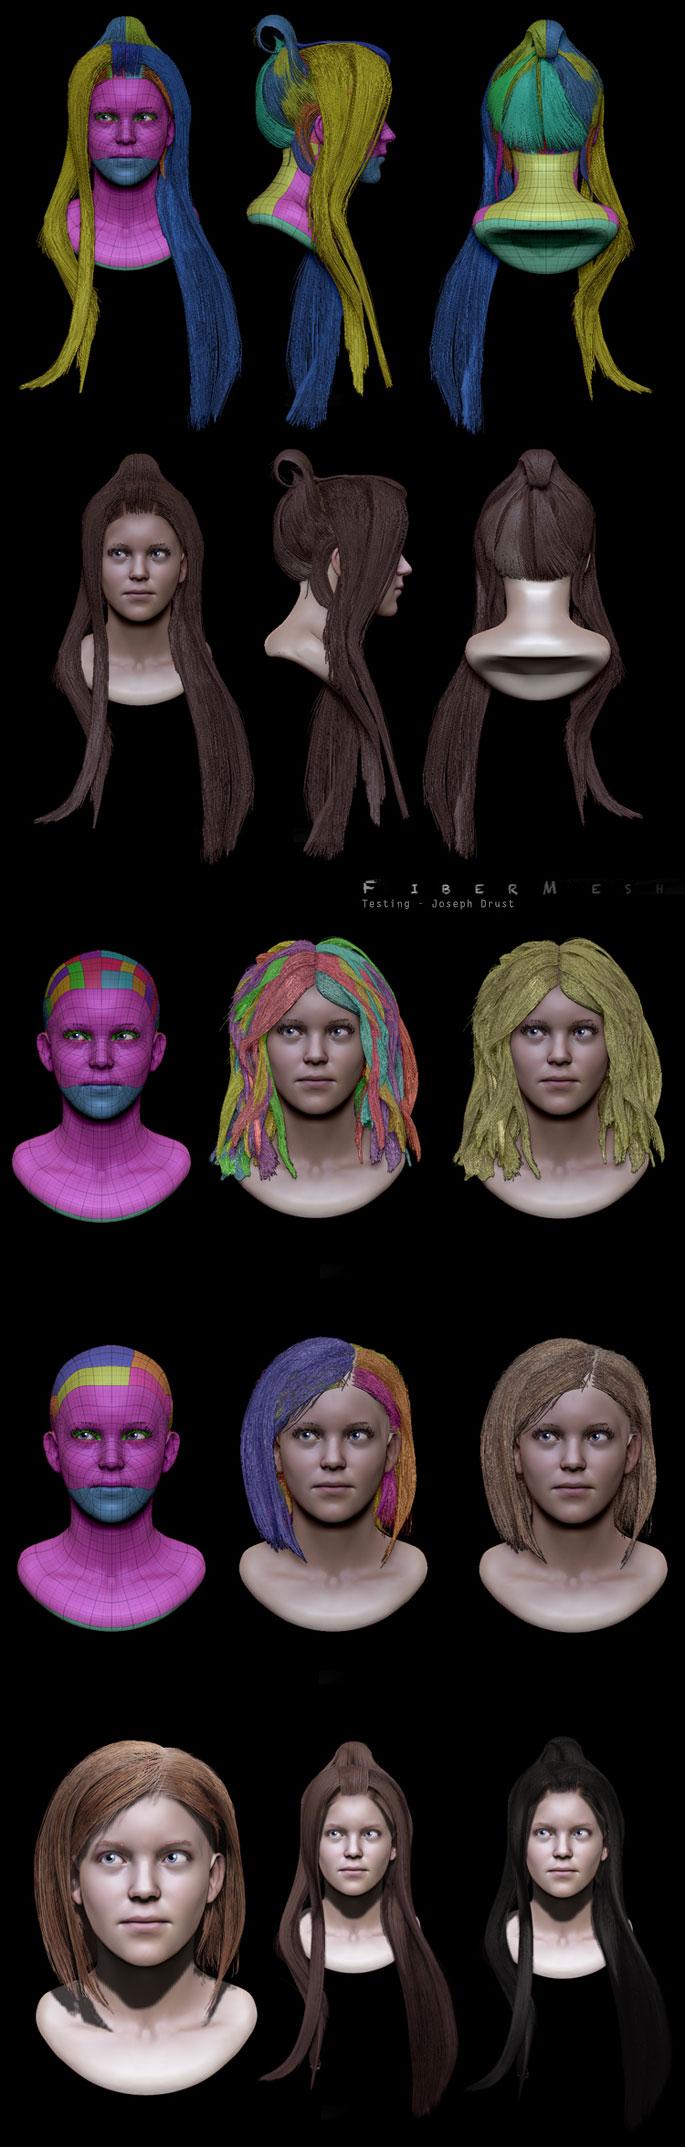 Ejemplo del nuevo pelo de Zbrush 4R2b